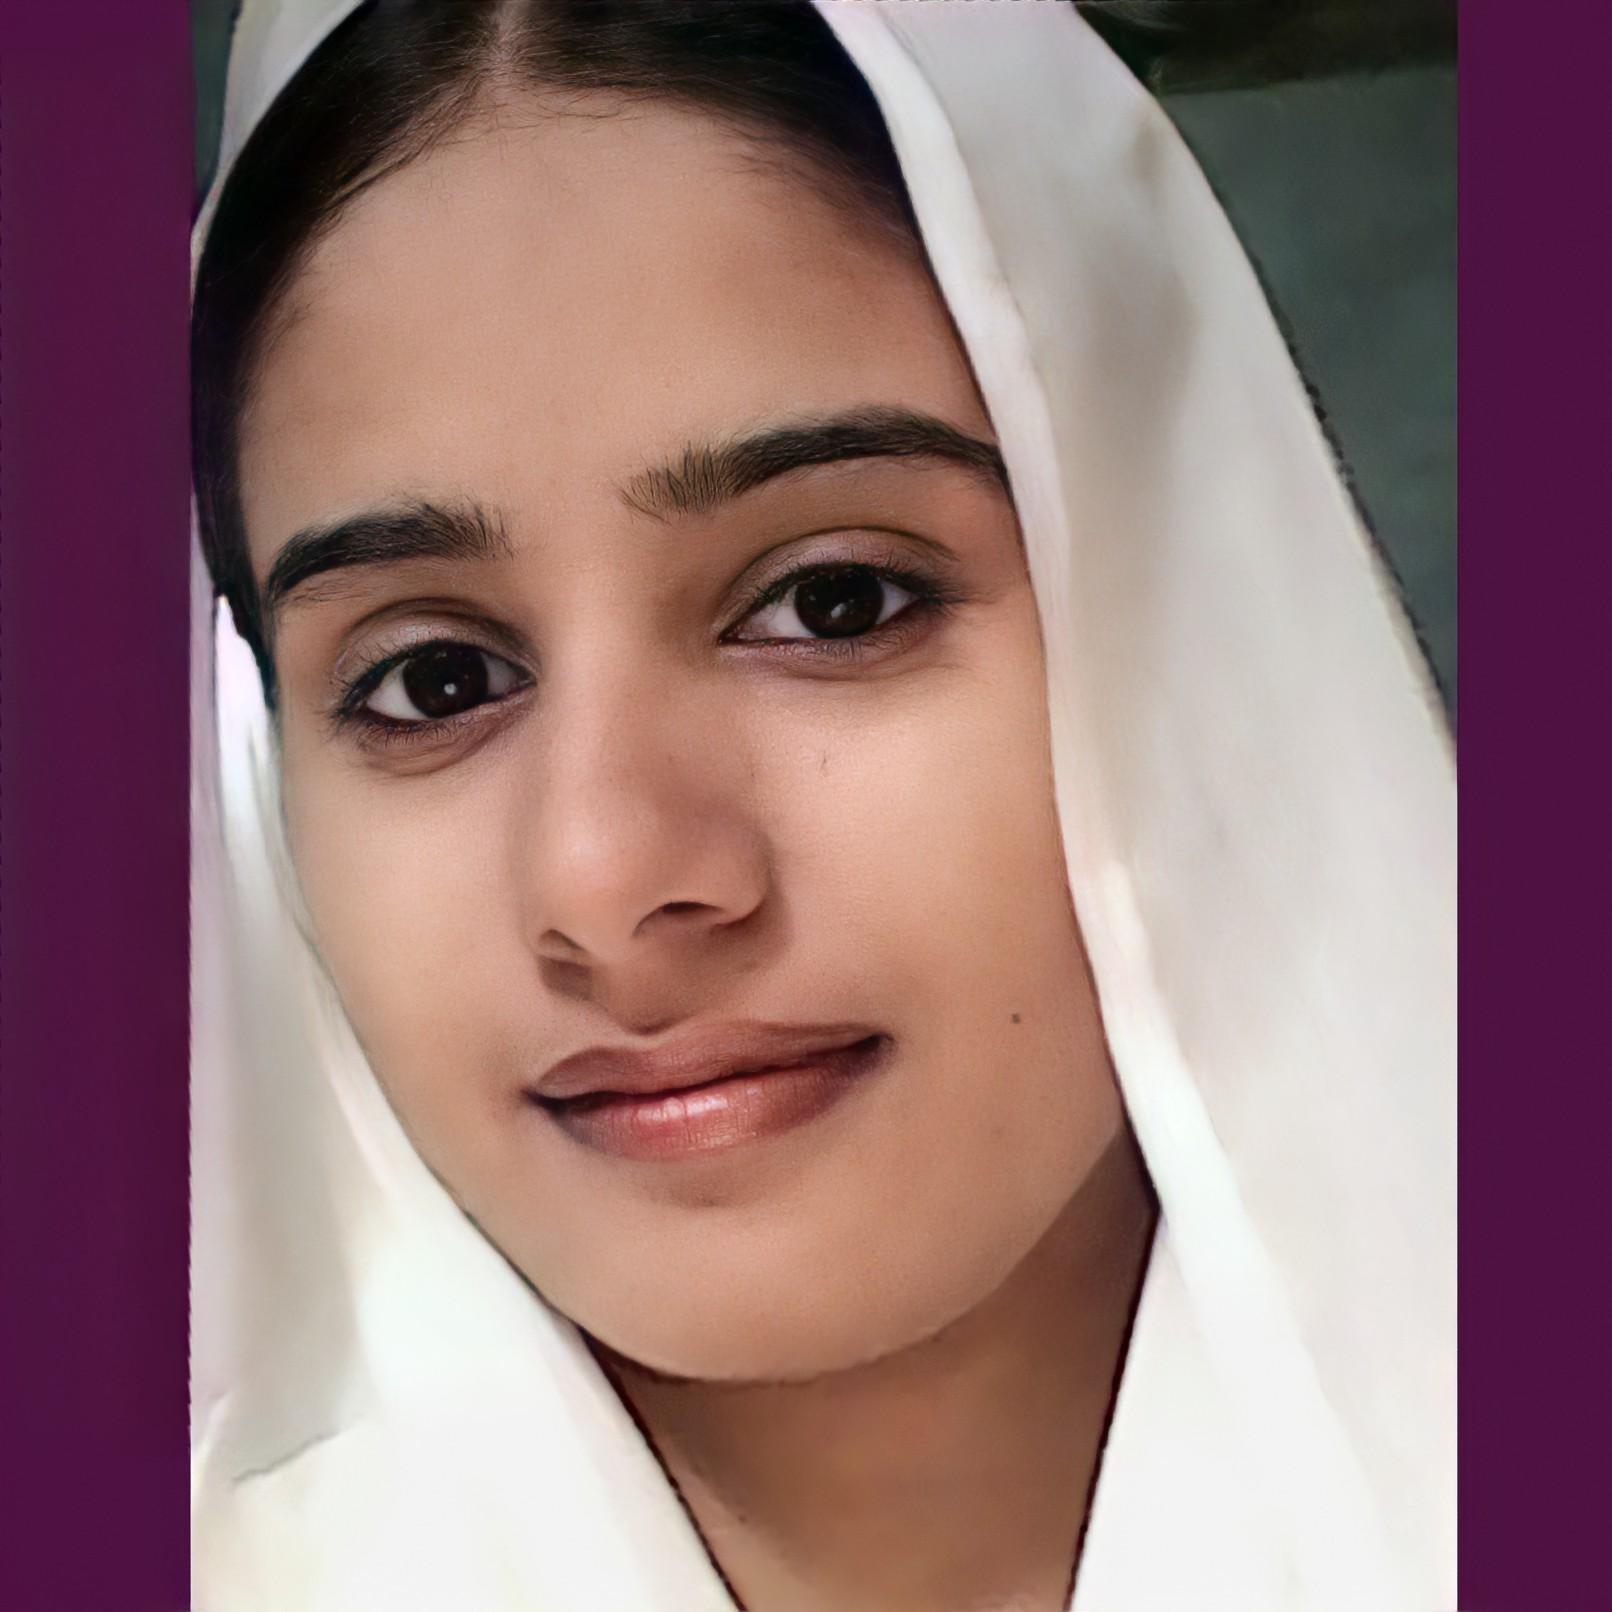 Saira Niaz